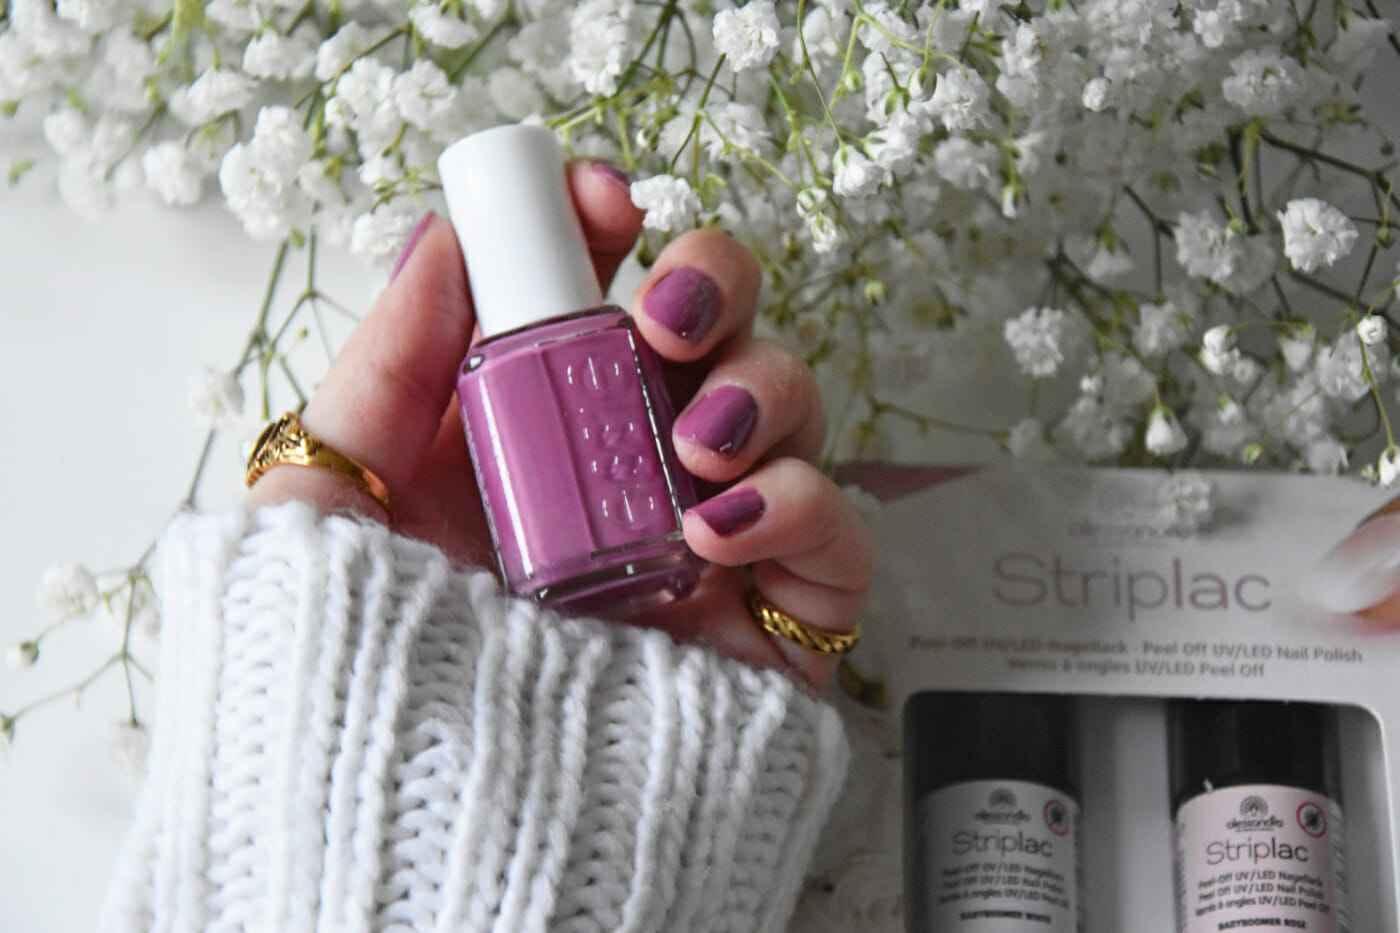 Essie Striplac nail nailpolish